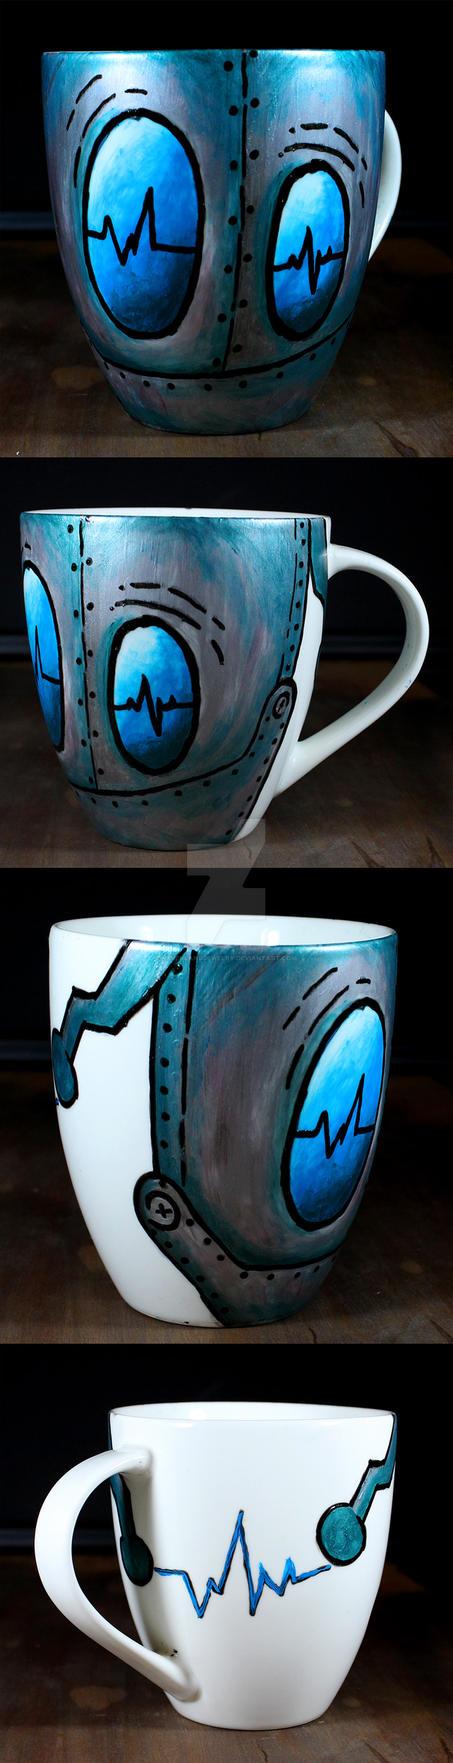 Handpainted Robot Cup by NeverlandJewelry